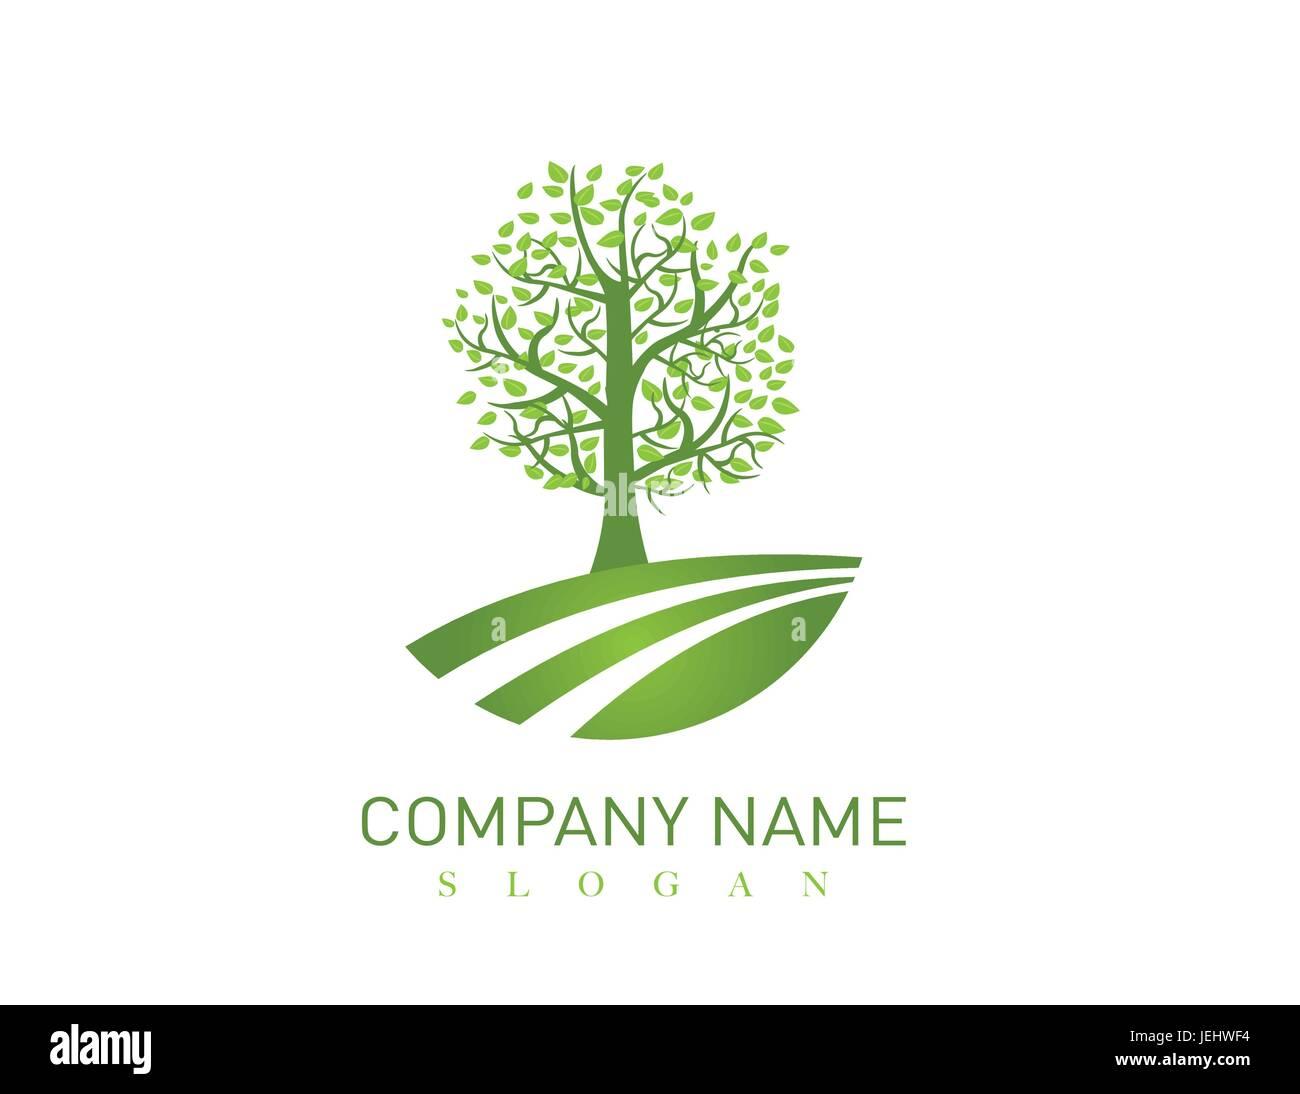 Oak tree design - Stock Image